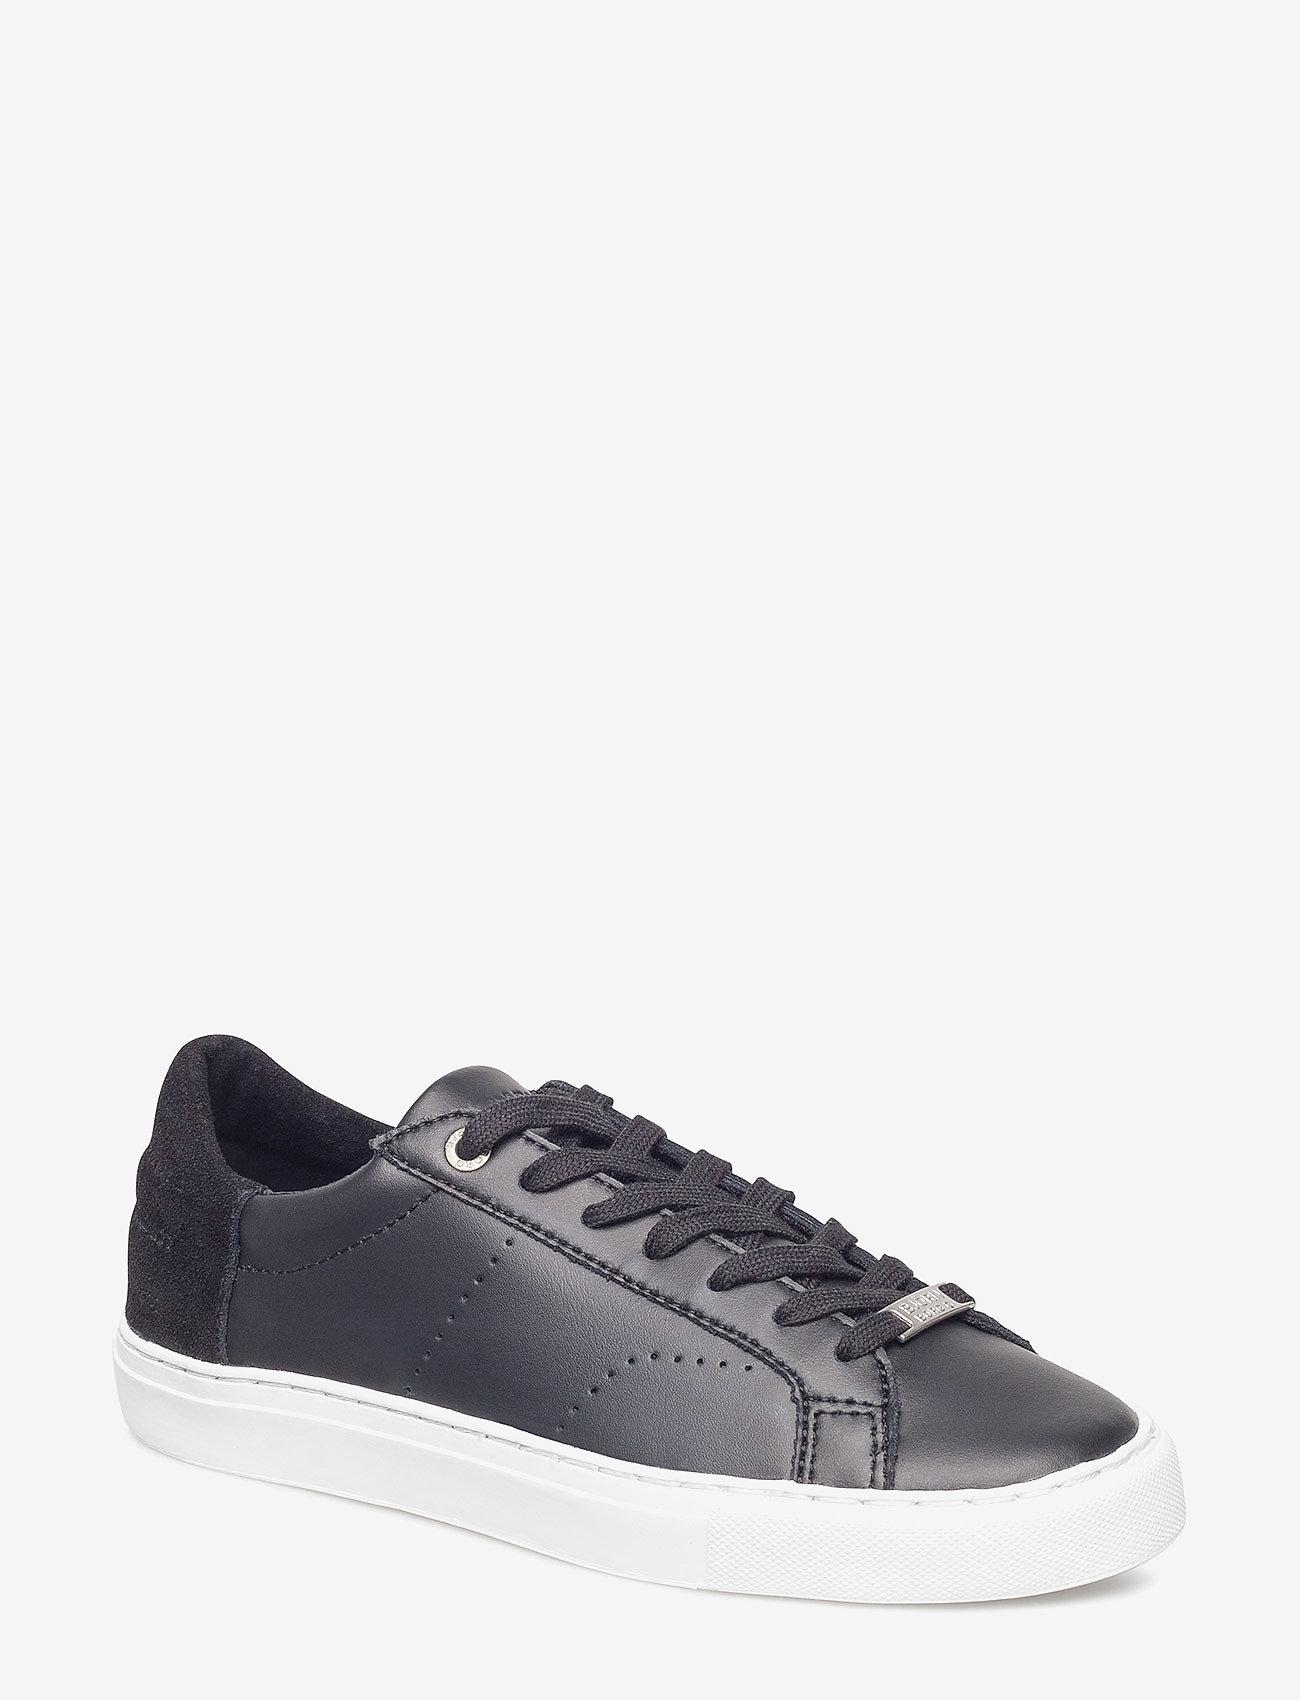 Björn Borg - T200 Low Fcy W - low top sneakers - black - 0